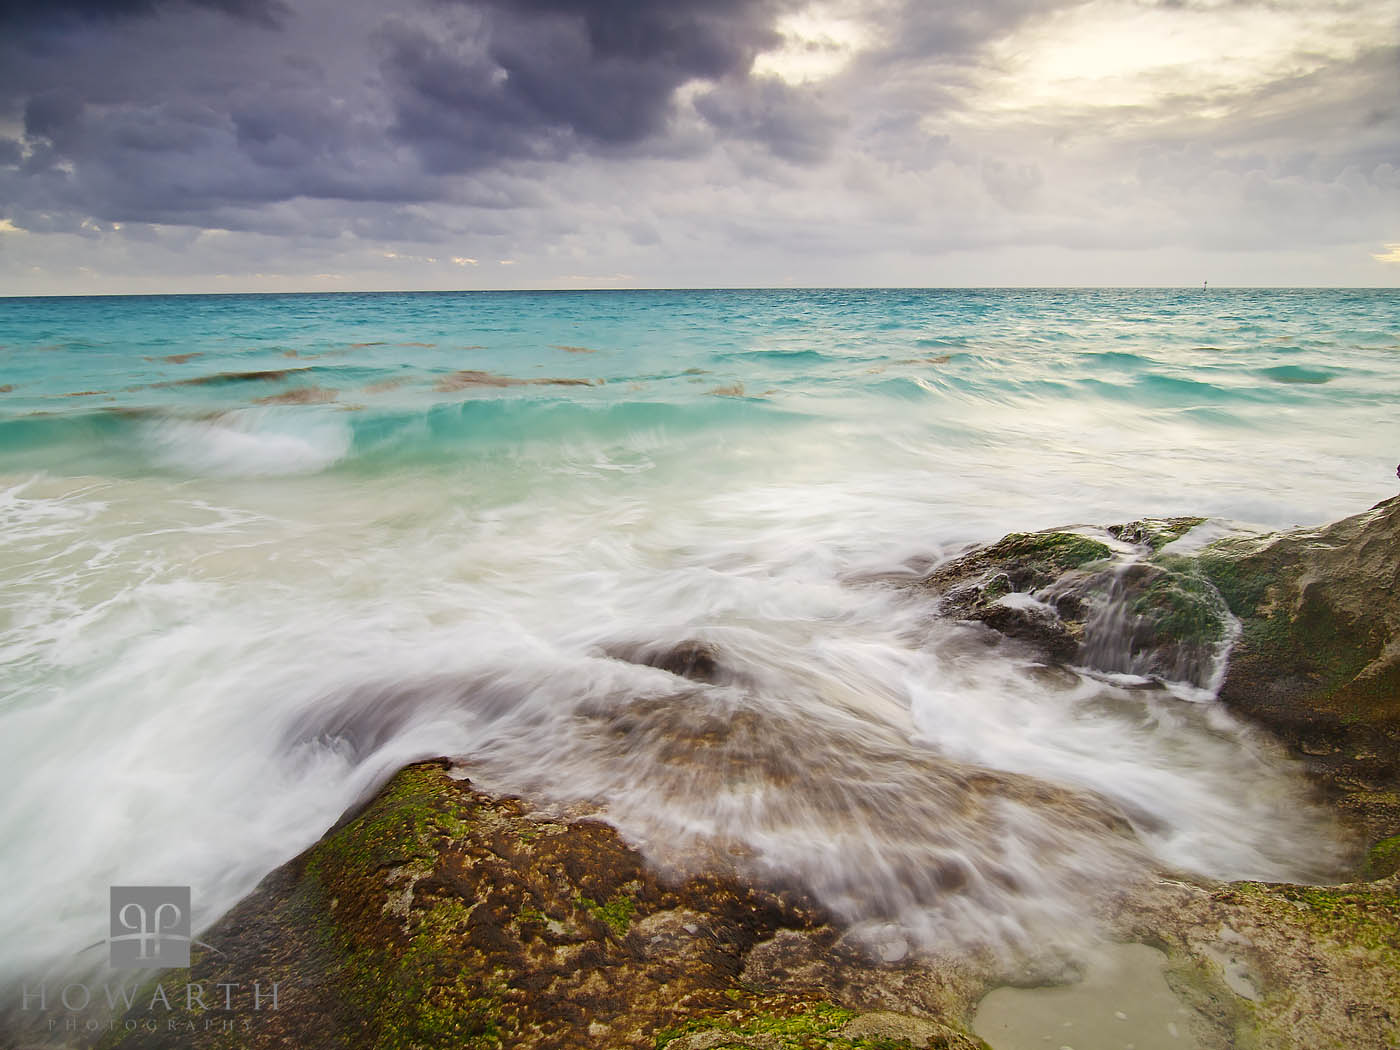 stormy, scene, whale, bay, southampton, clouds, sea, photo